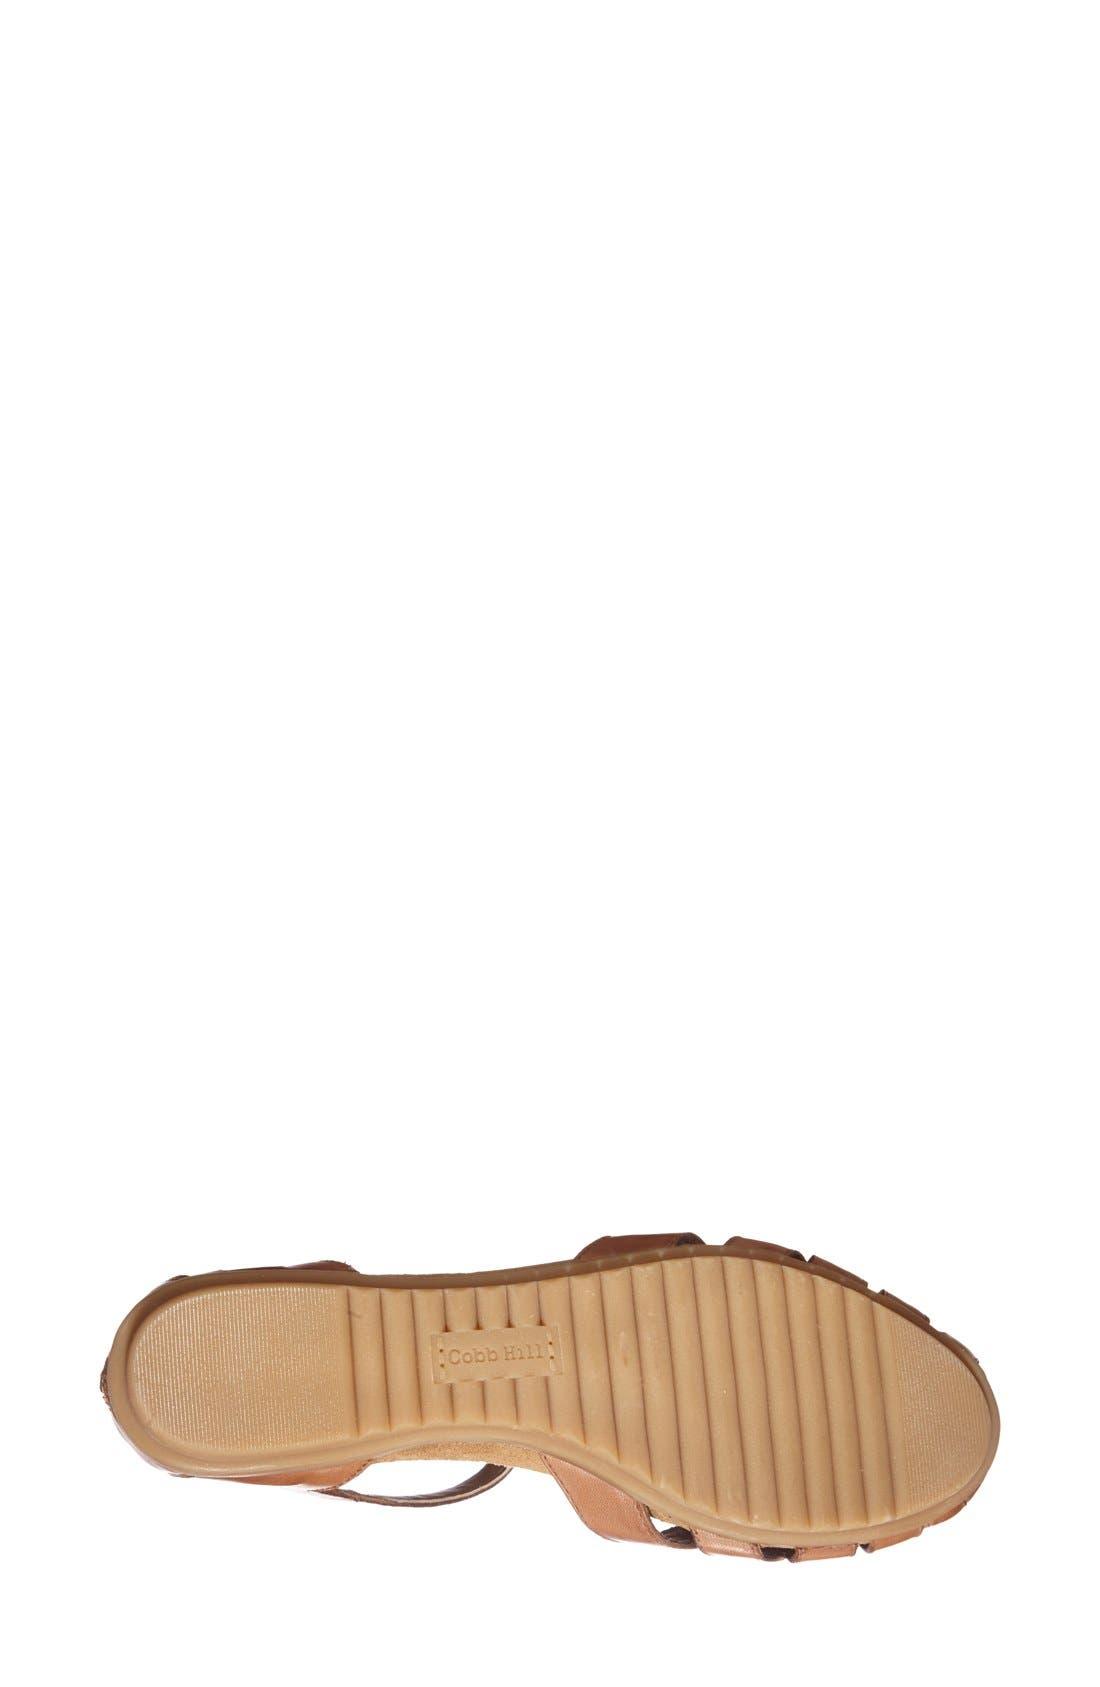 'Ireland' Leather Sandal,                             Alternate thumbnail 3, color,                             TAN